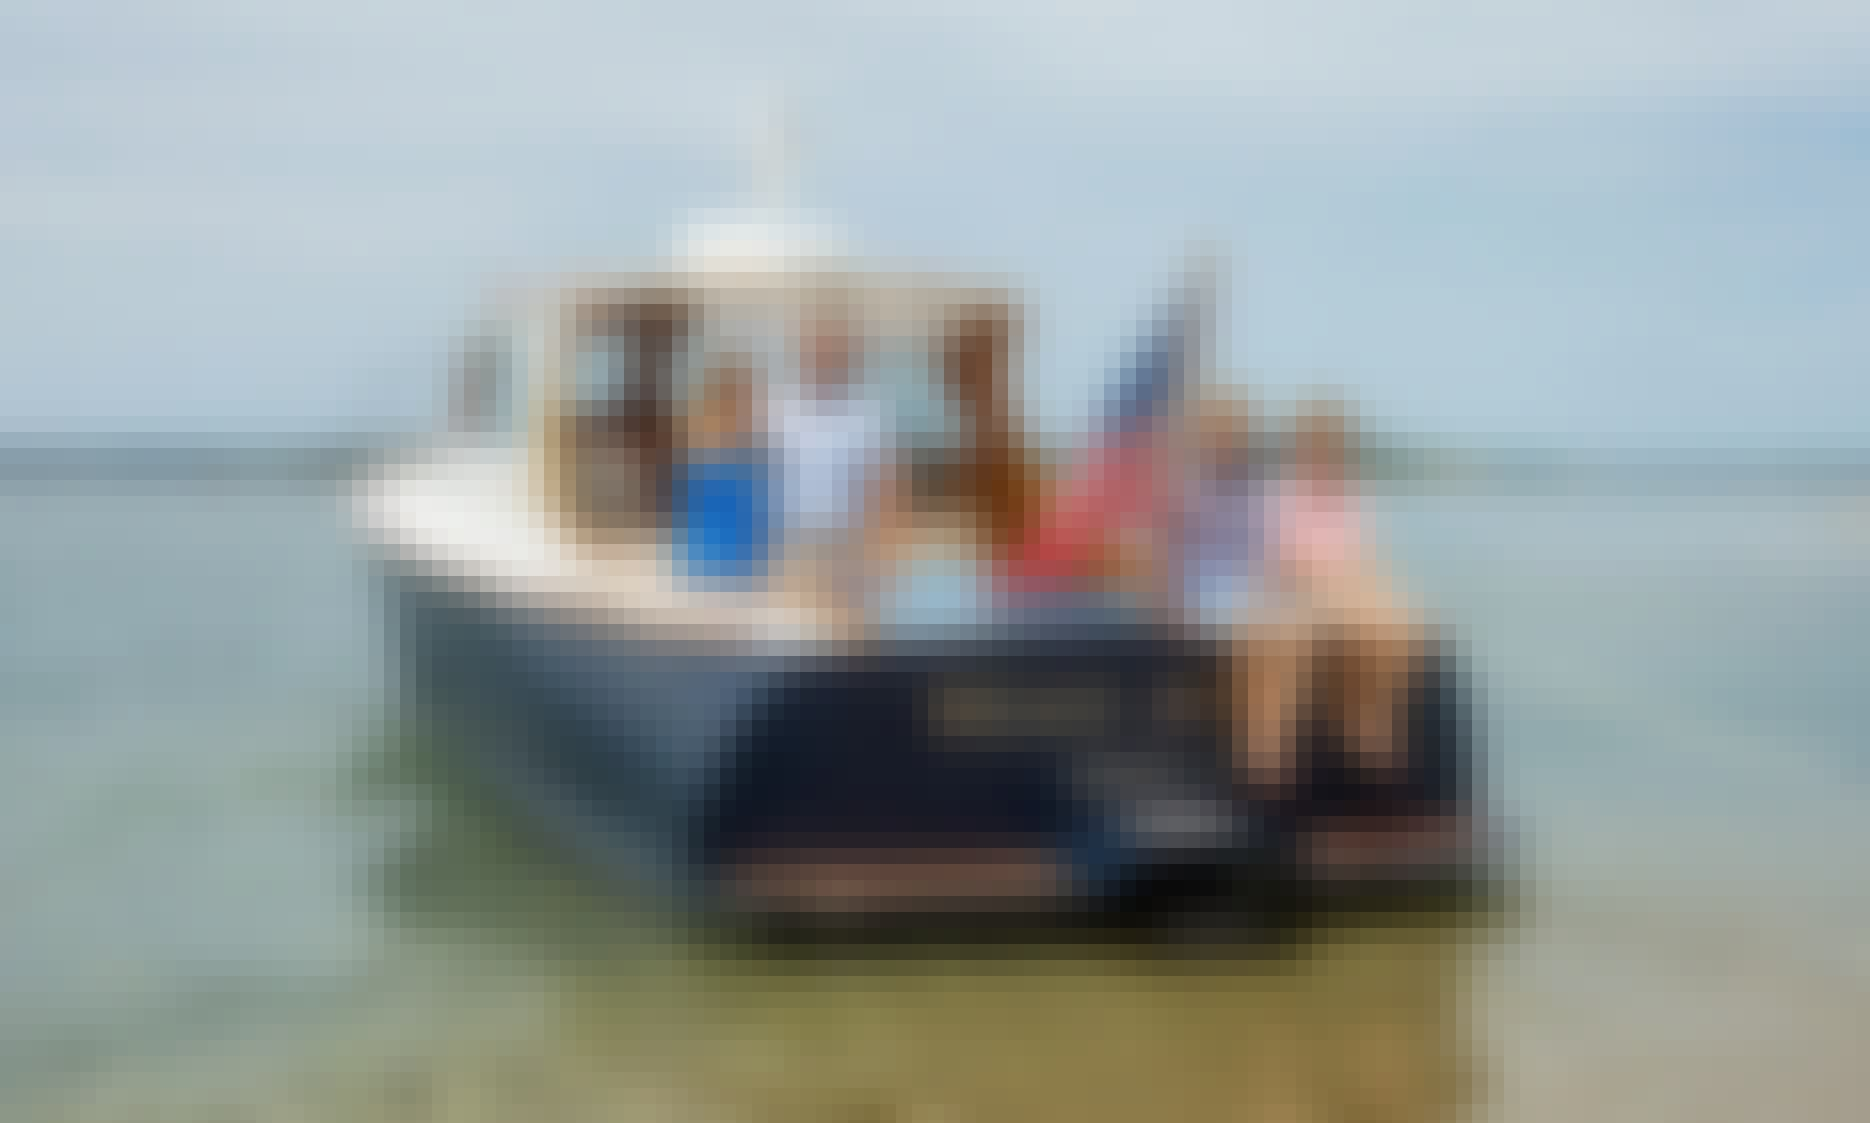 Yacht Charter Tours Around Nantucket, MA Onboard 36' Hinckley Motor Yacht